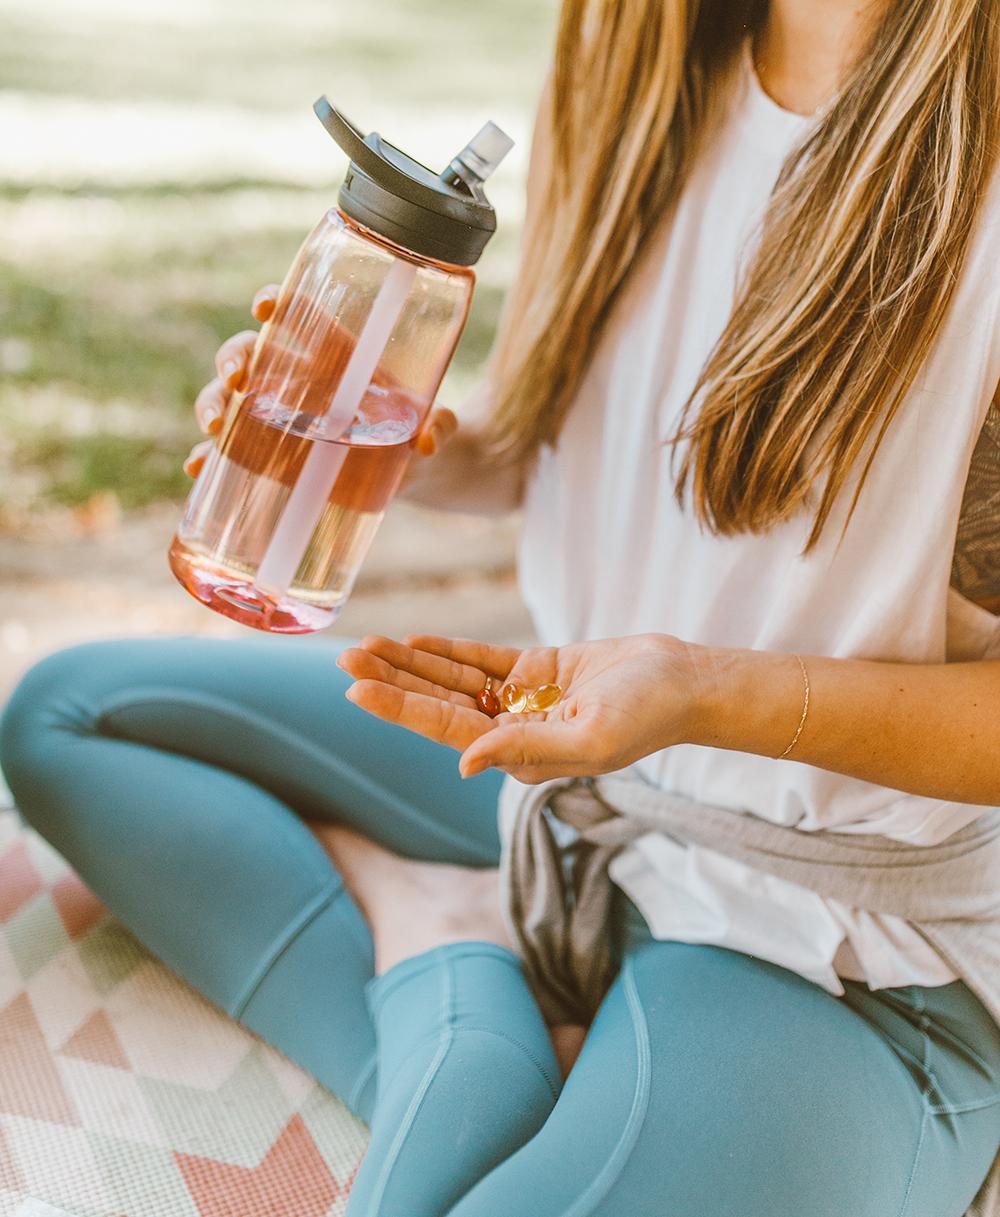 livvyland-blog-olivia-watson-mom-lifestyle-fashion-blogger-meology-shaklee-personalized-wellness-postpartum-vitamins-4